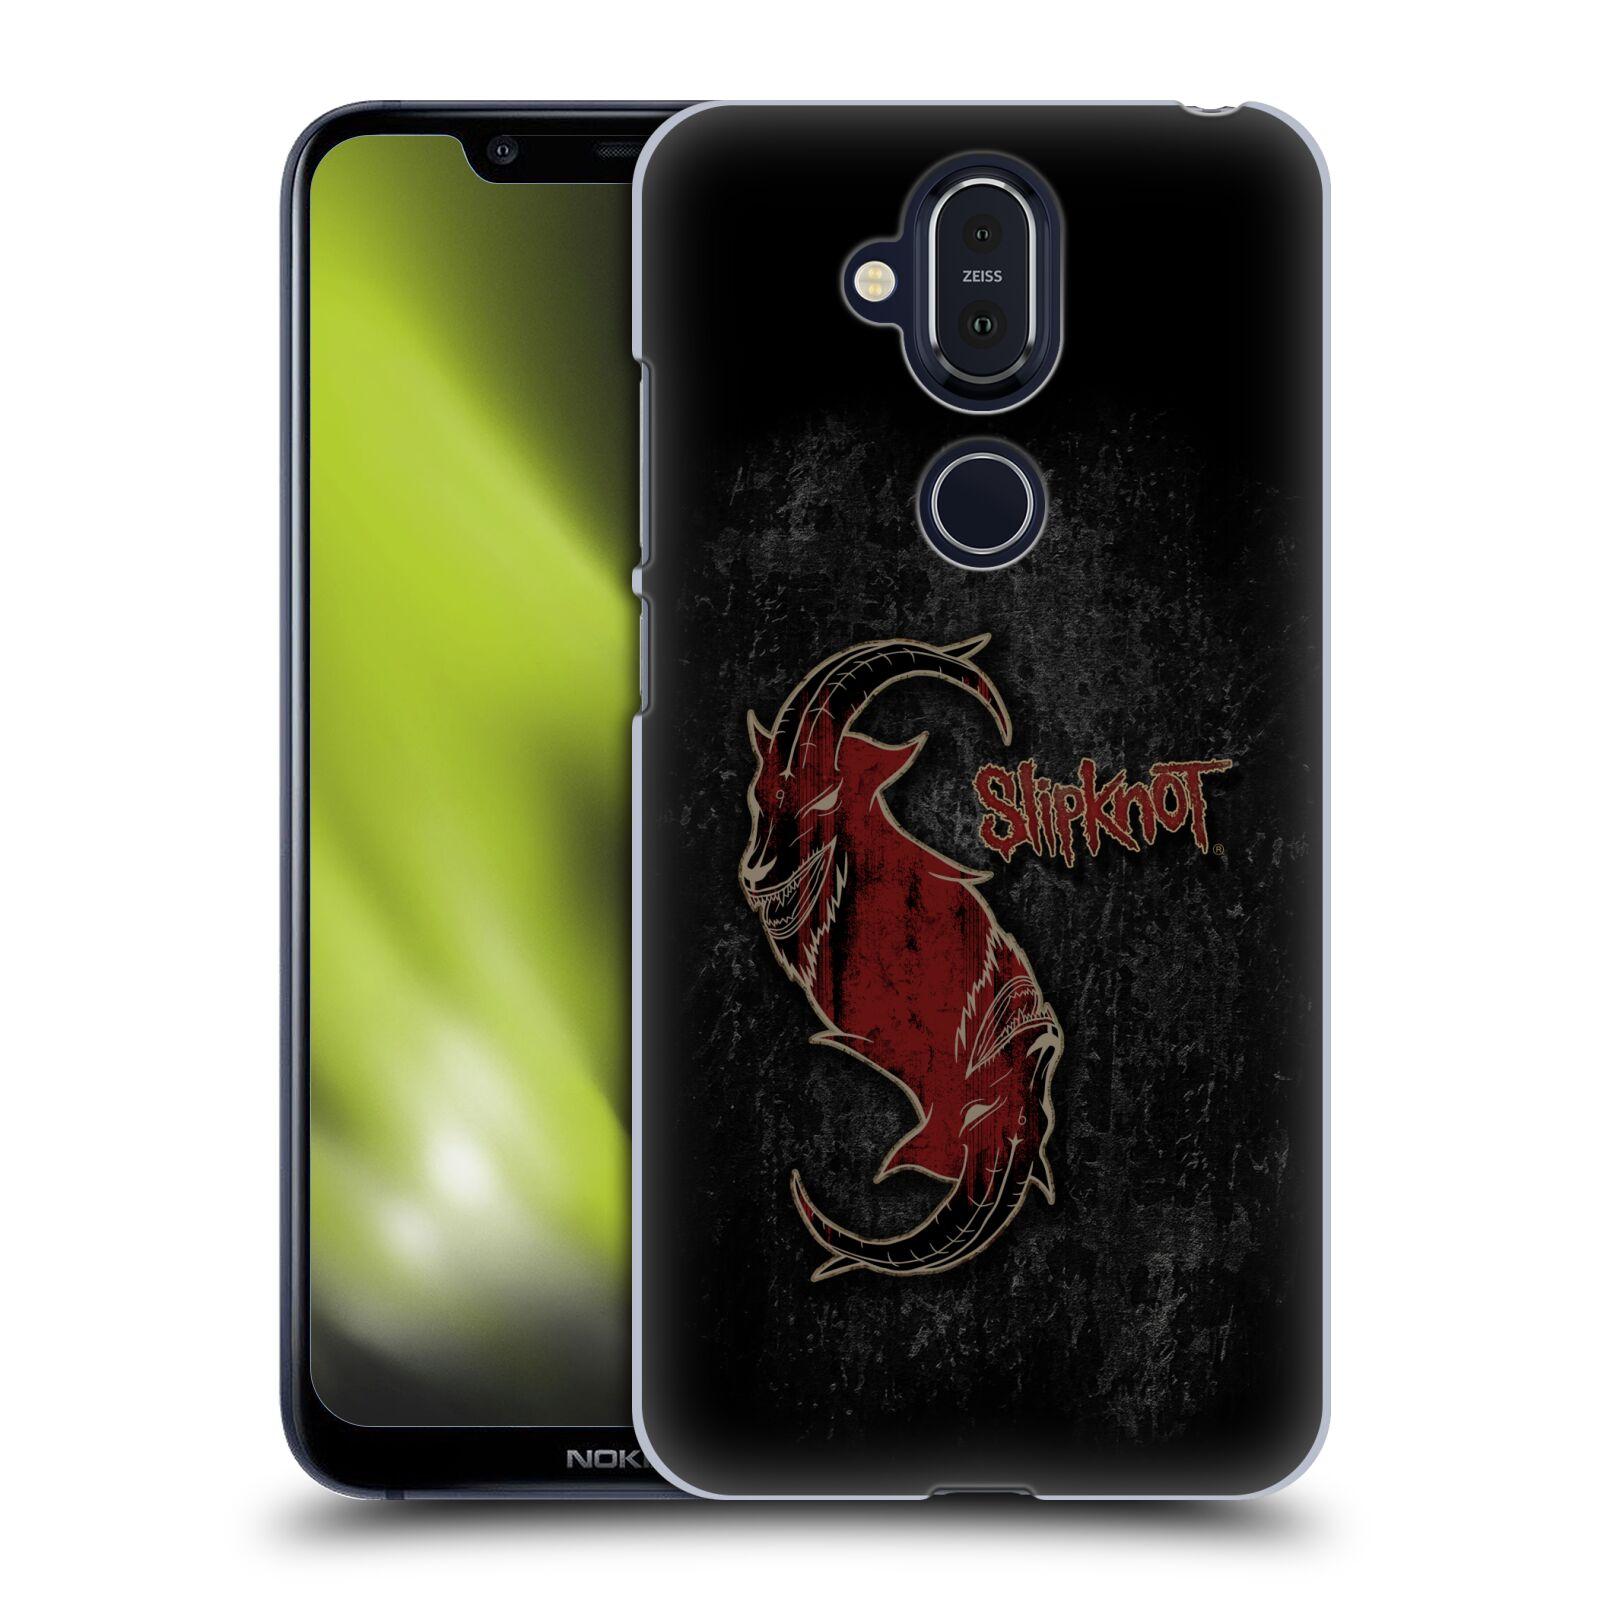 Plastové pouzdro na mobil Nokia 8.1 - Head Case - Slipknot - Rudý kozel